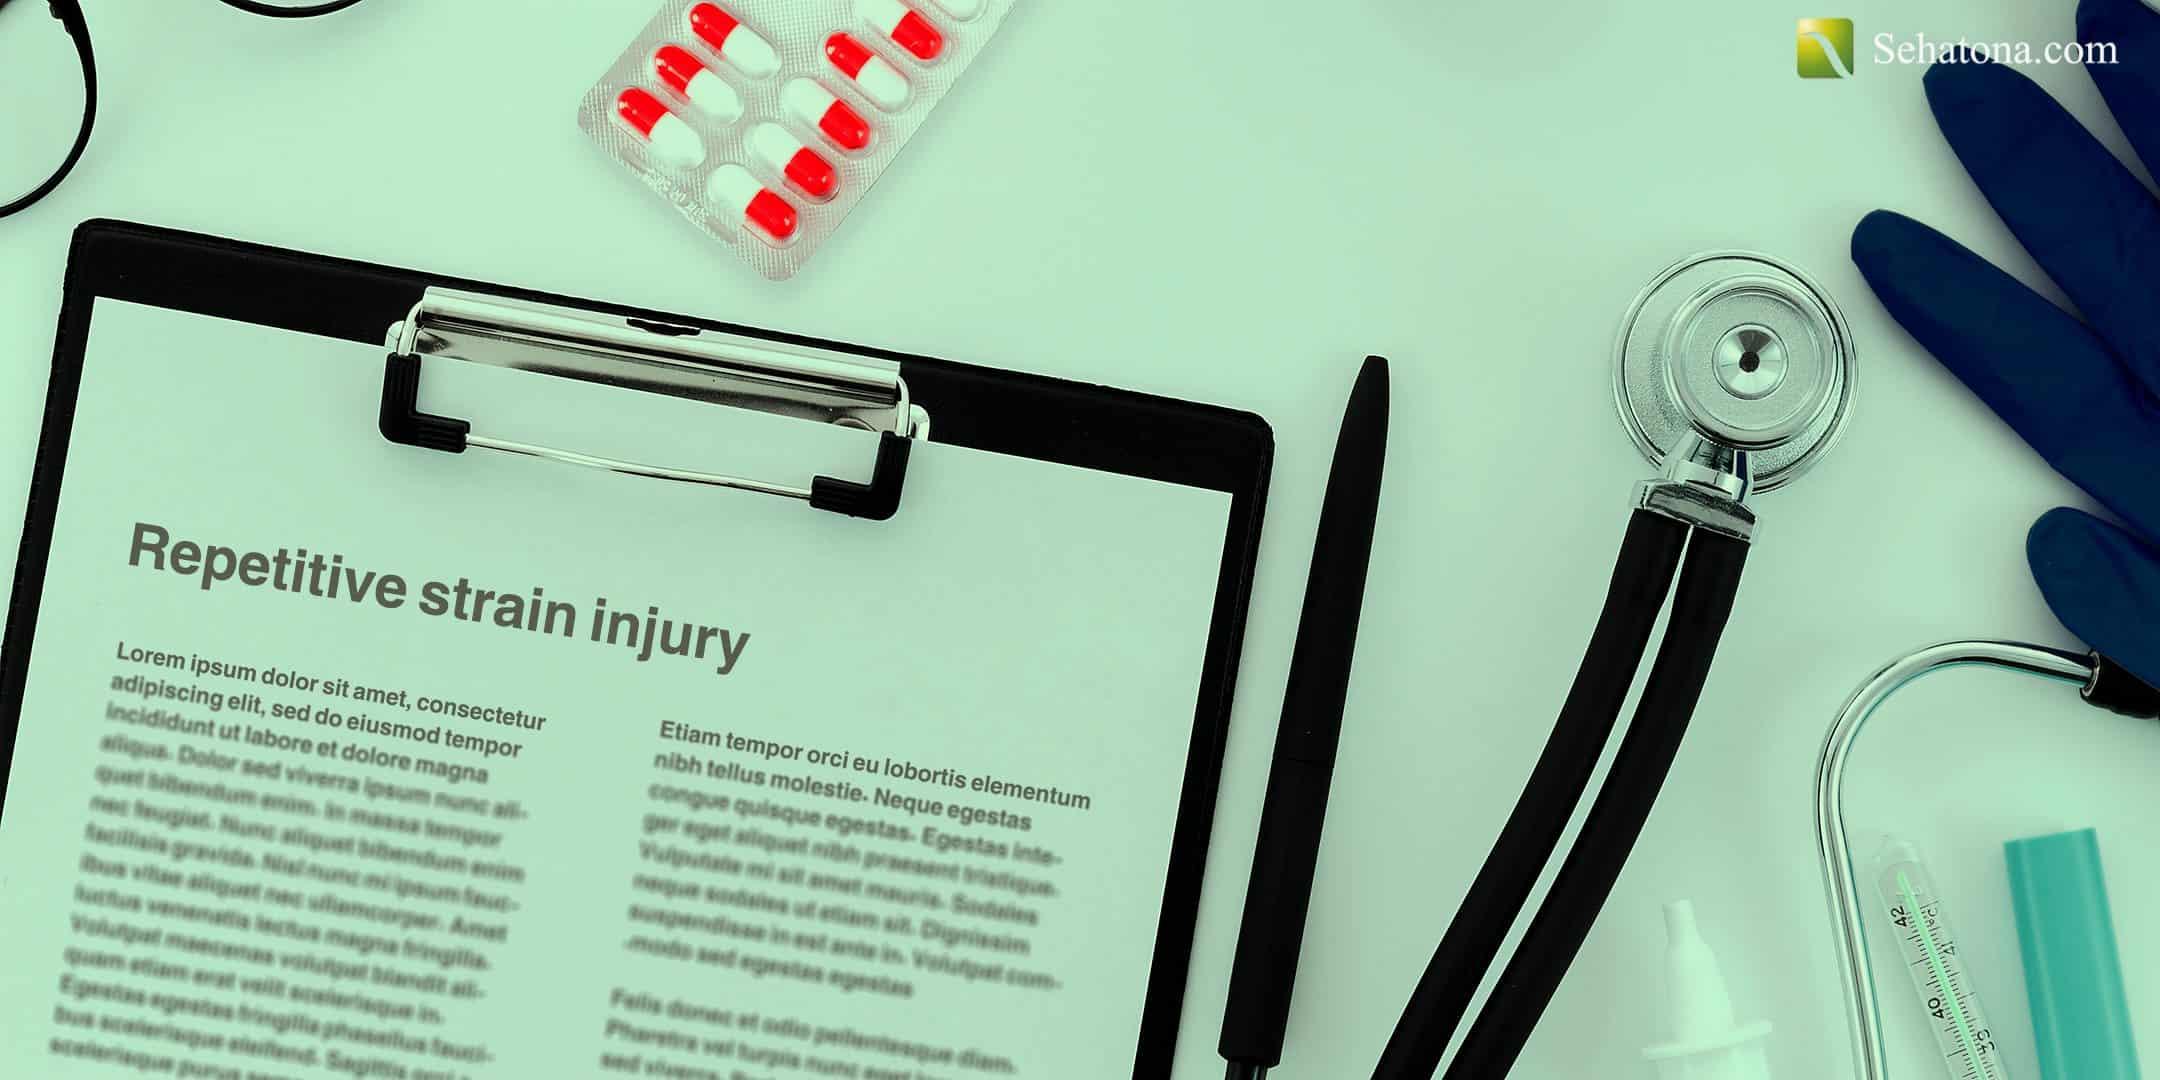 رضح الاجهاد المتكرر Repetitive strain injury